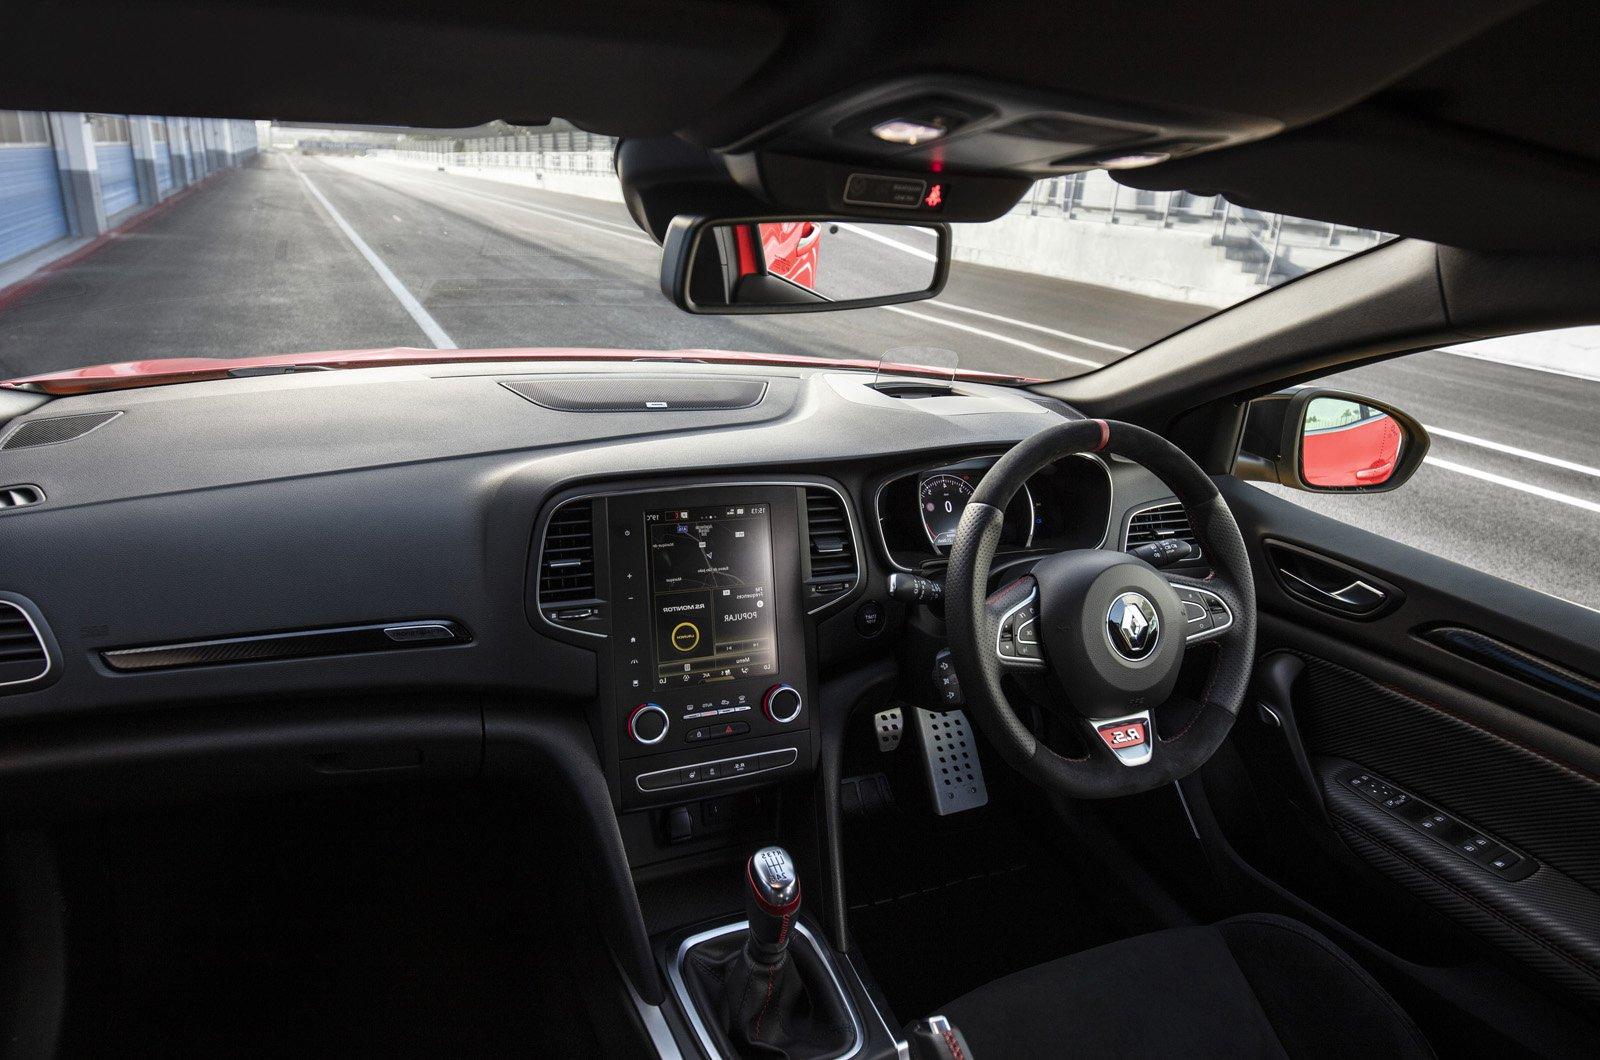 LT Renault Megane RS interior in pitlane